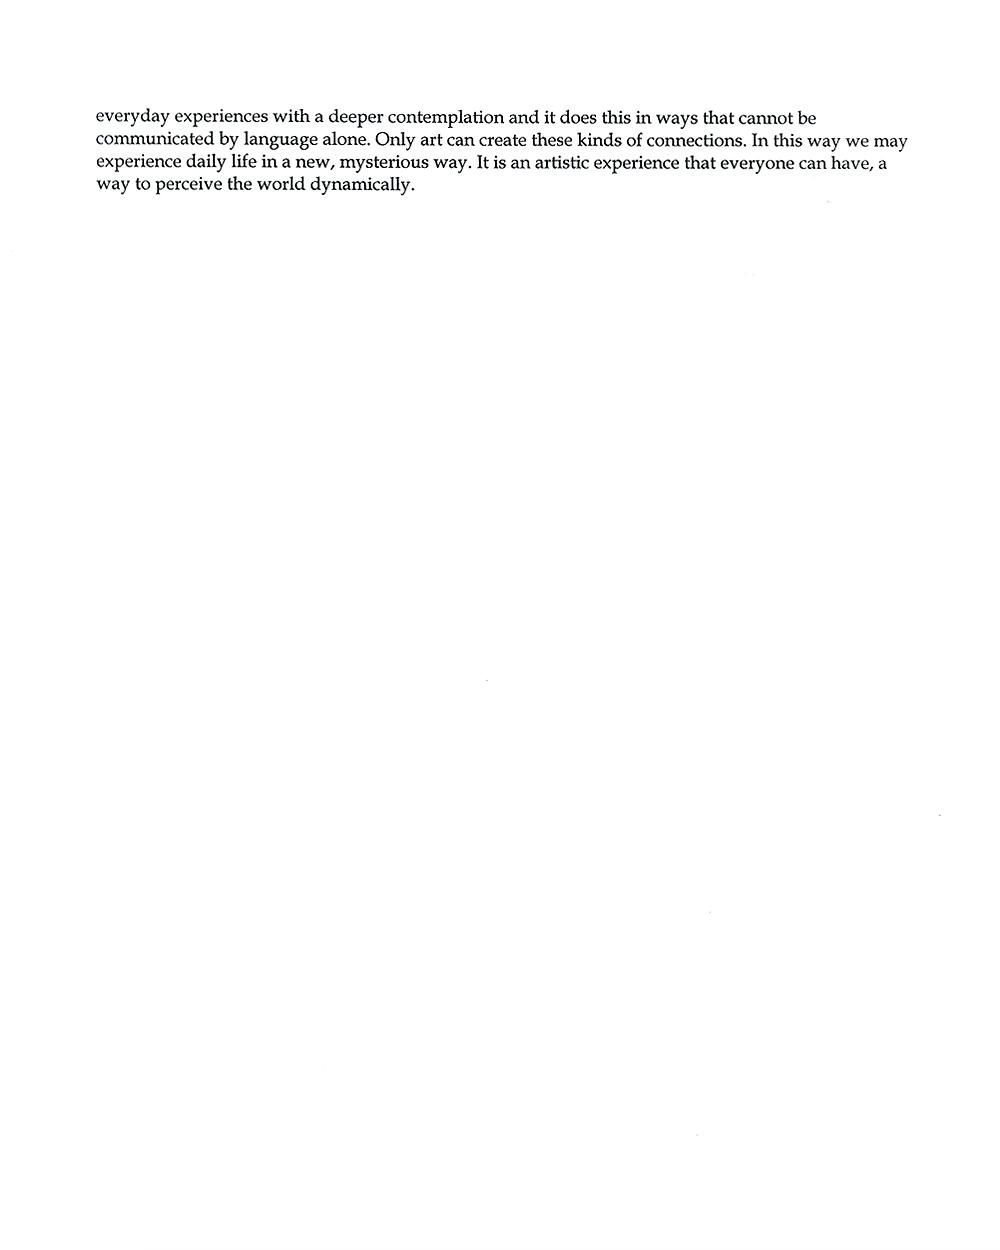 Hirokazu Fukawa's Artist Statement, pg 2